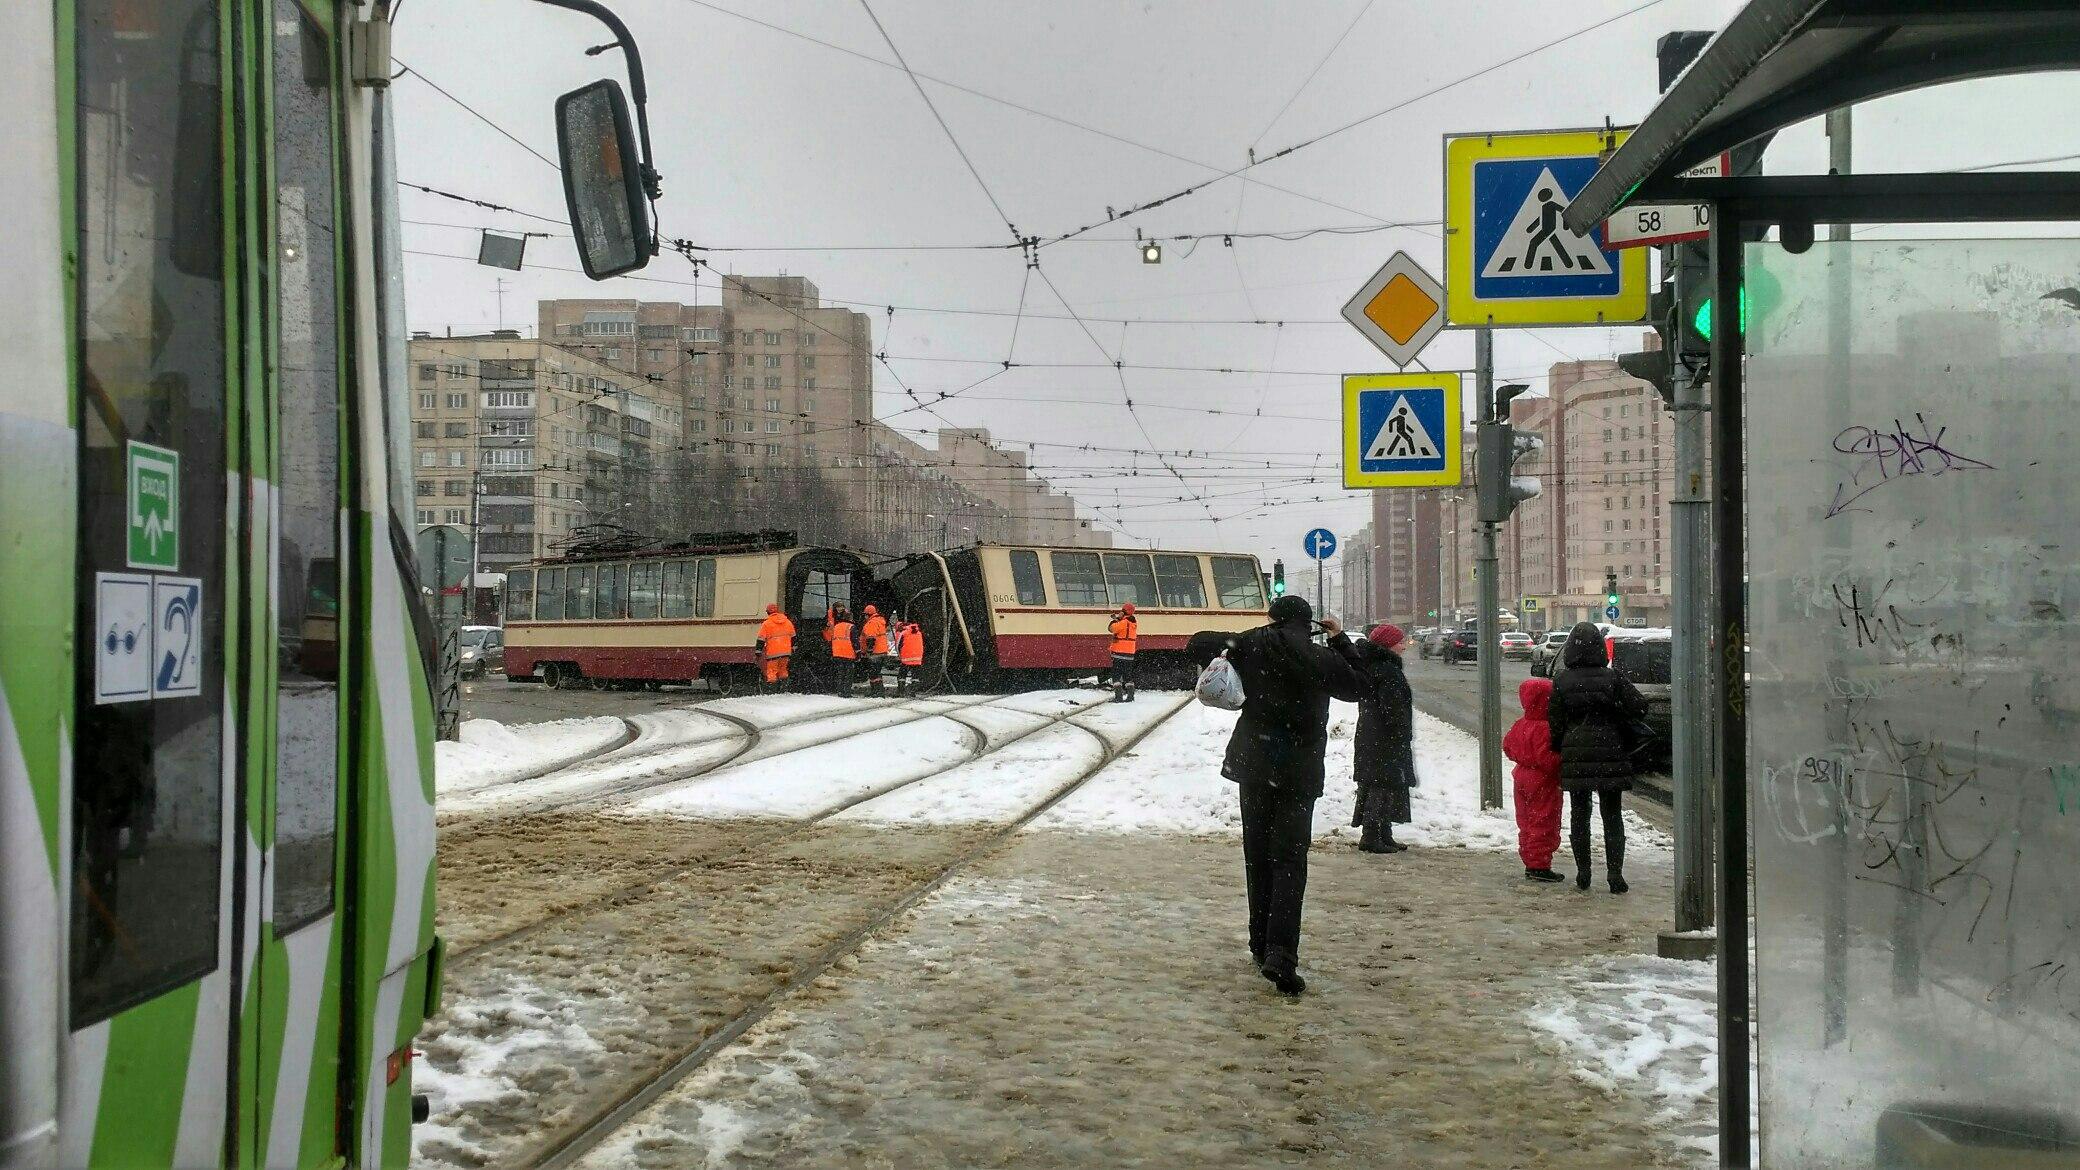 ВПетербурге трамвай разорвало начасти